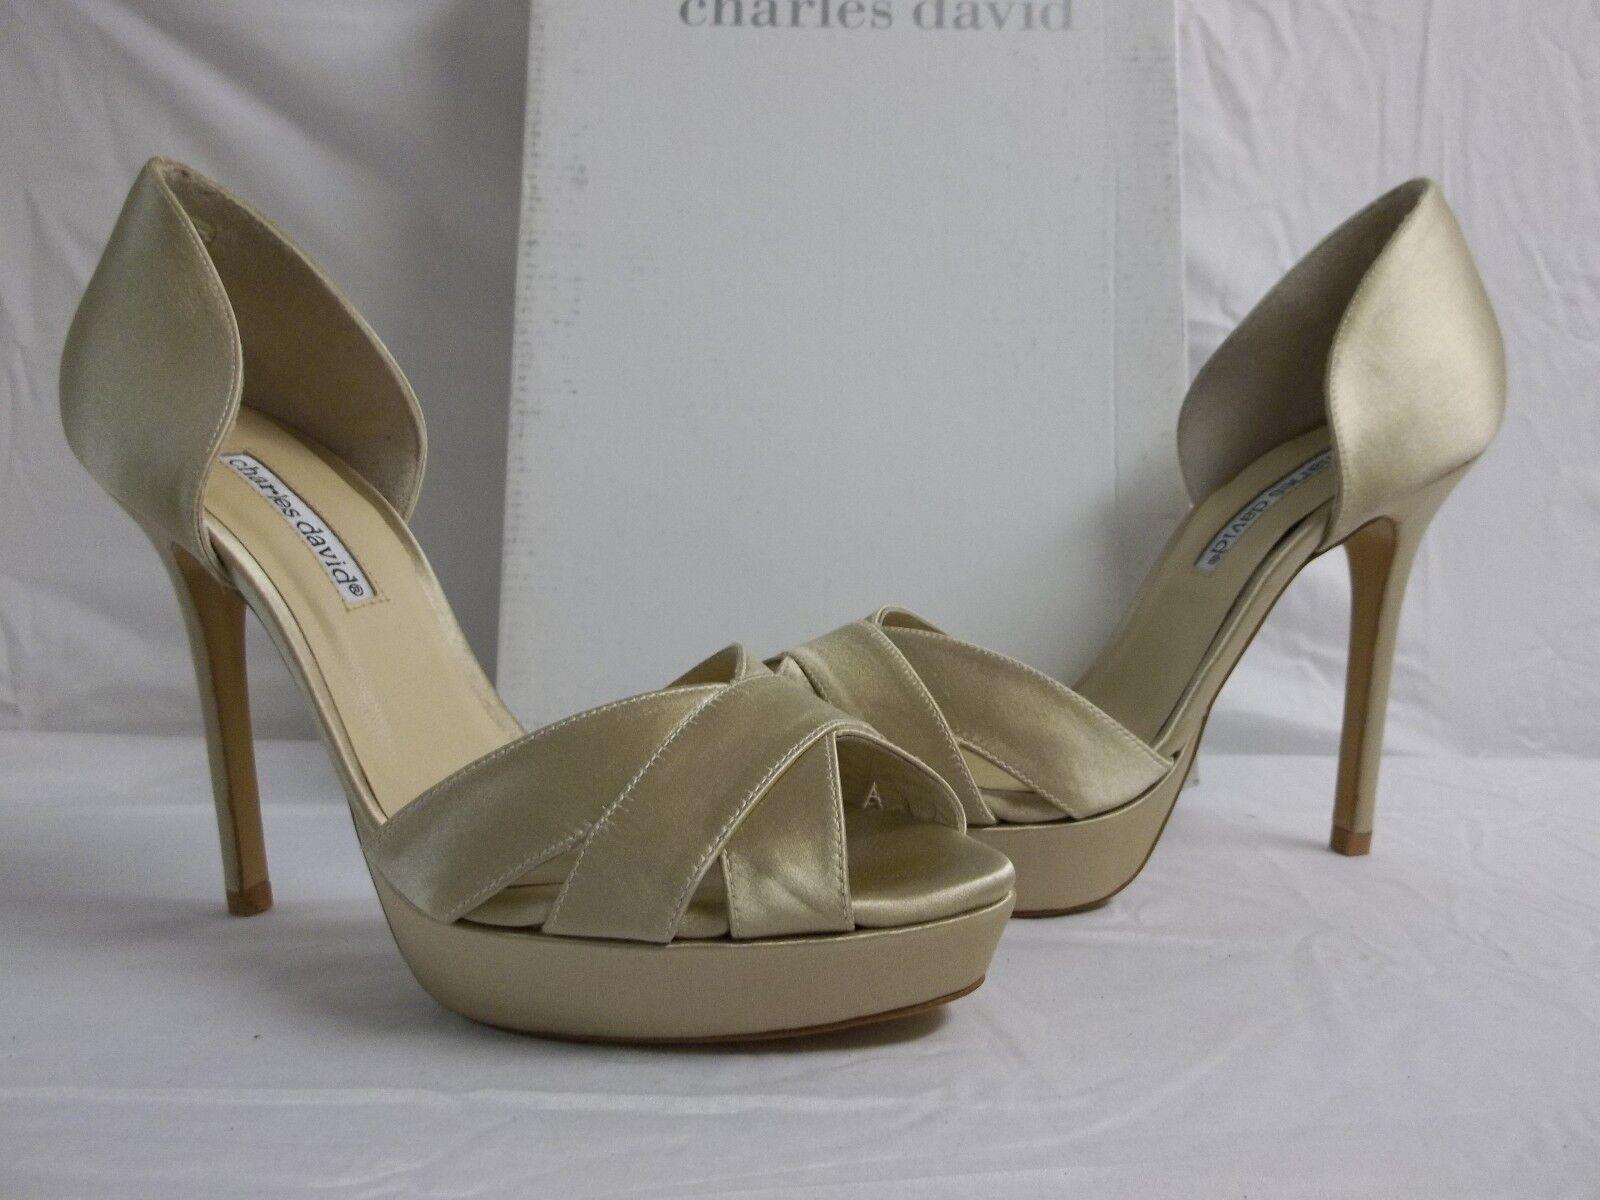 Charles David Größe 9.5 M Seduce Champagne Satin Open Toe Heels NEU Damenschuhe Schuhes